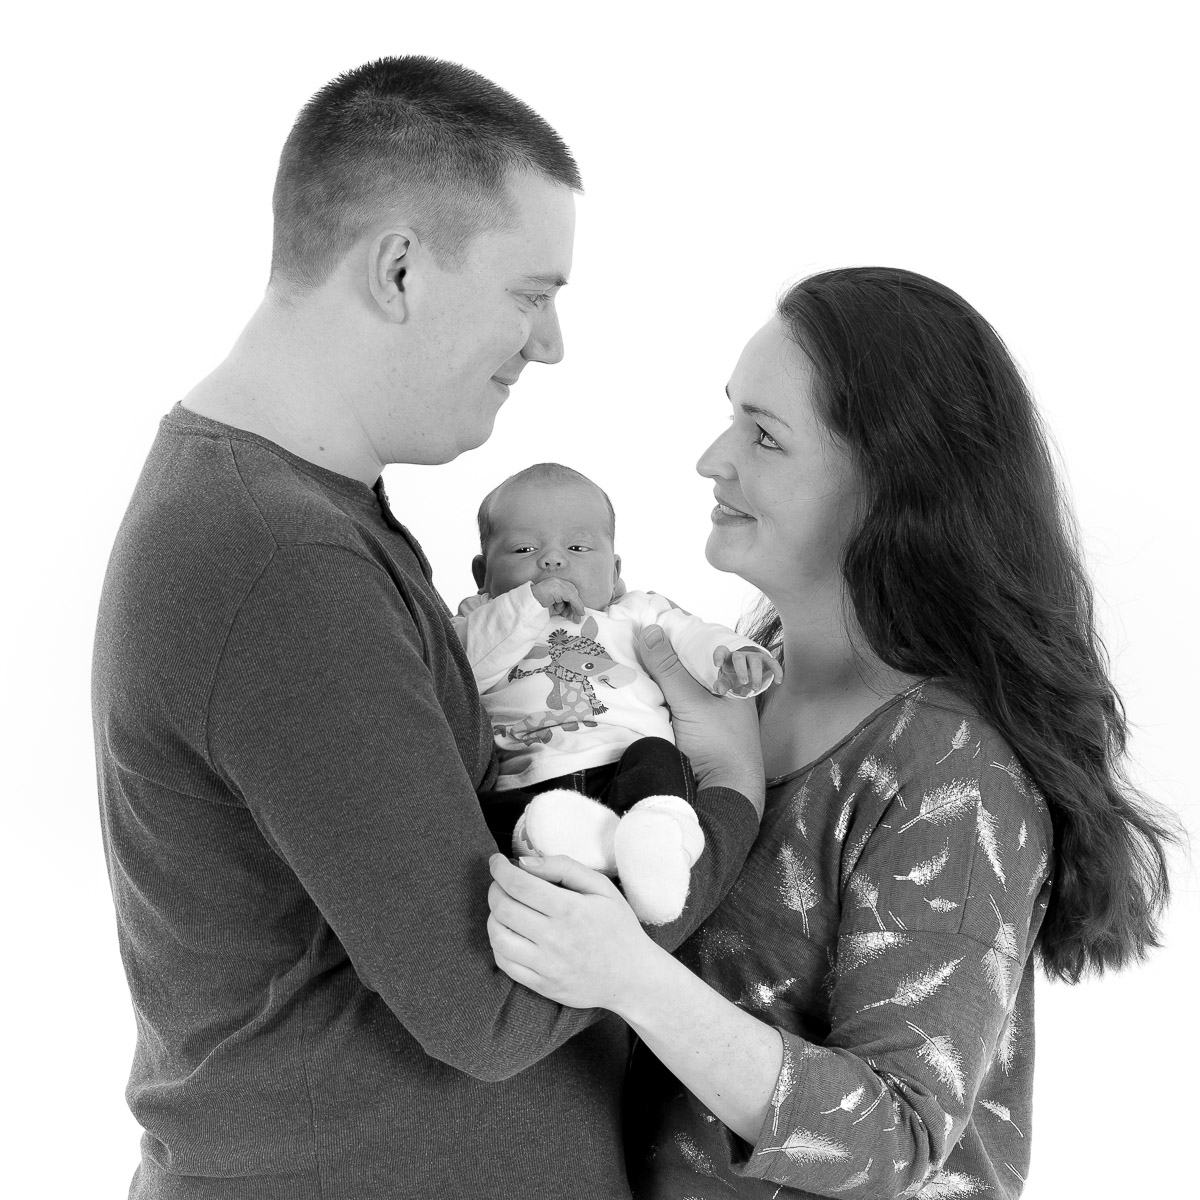 Zwangershcapsfotoshoots-Portretfotograaf-fotoshoots-Zwijndrecht-Dordrecht-Rotterdam-Zuid Holland-Rikervp-1-3